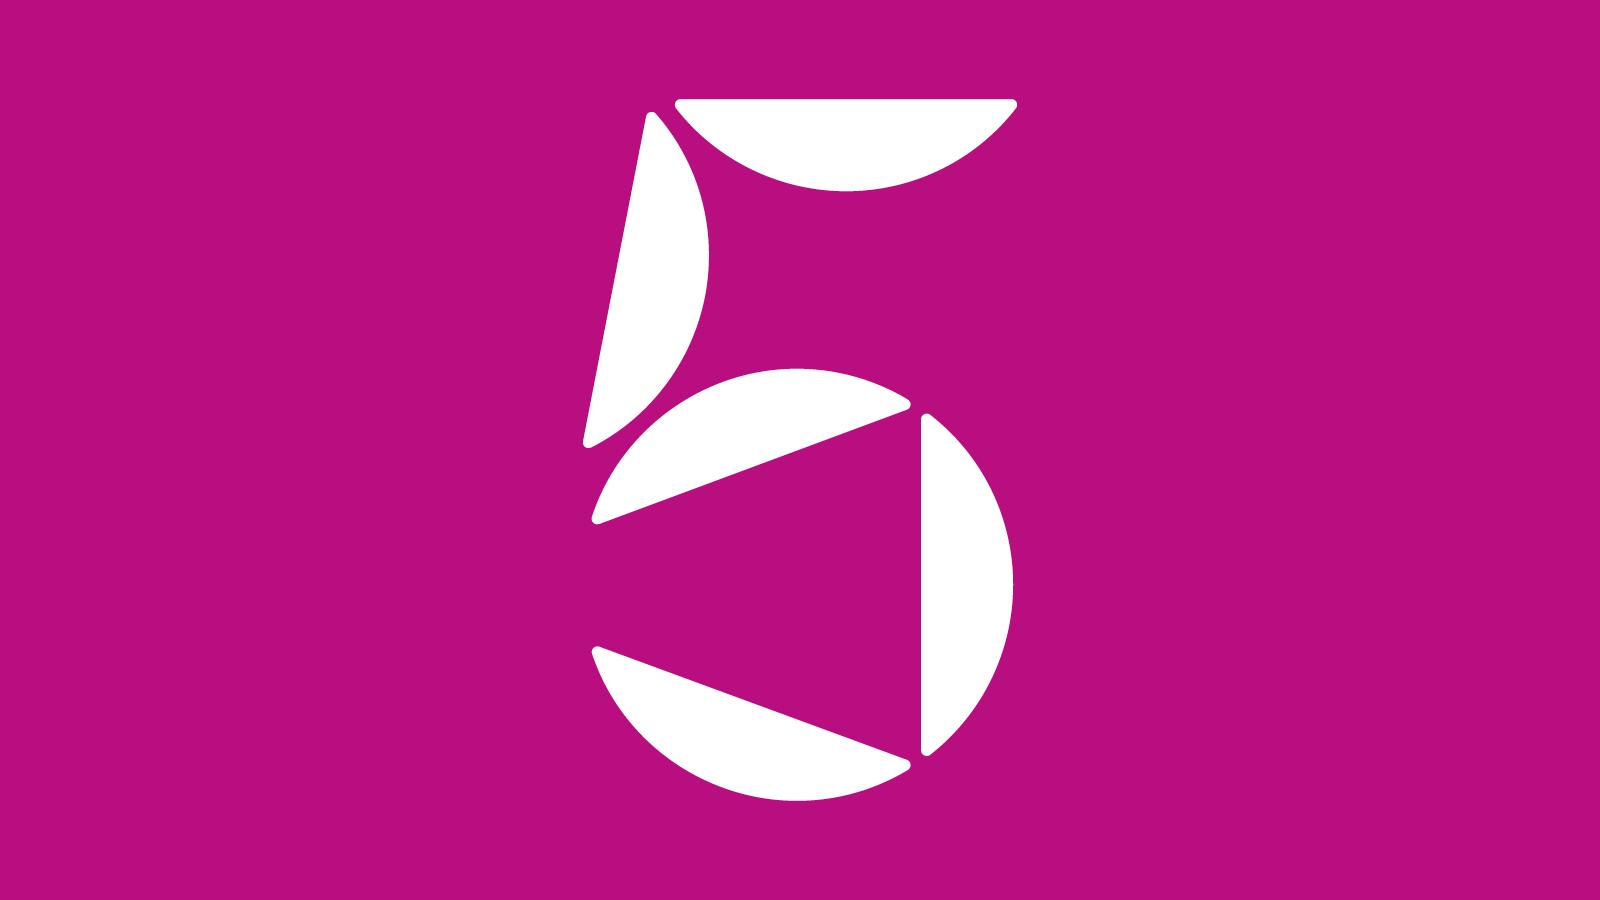 identity-design-logo-gym-gymnastics-british-five-typography-branding-milton-keynes-18